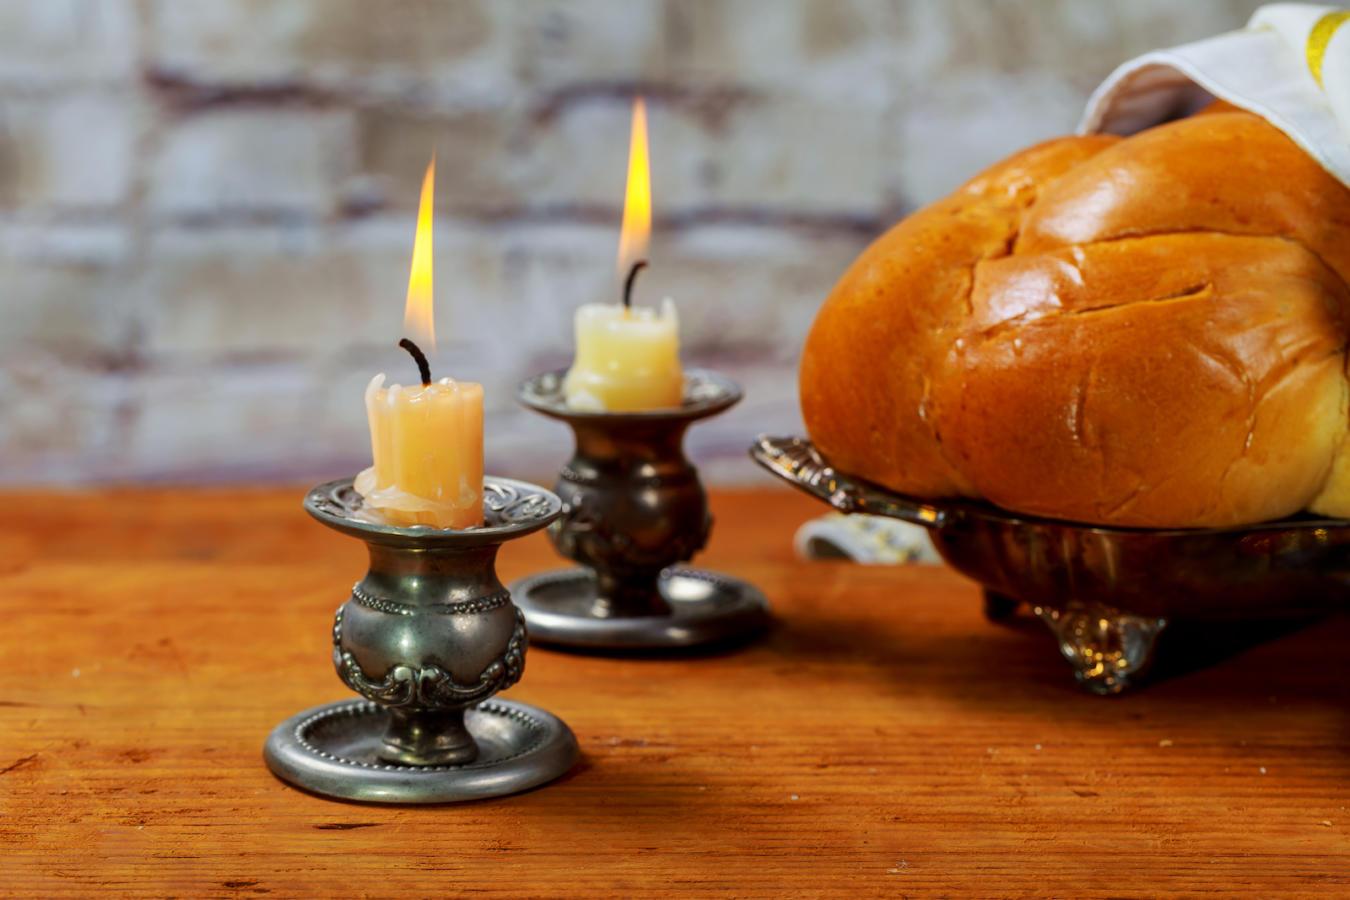 Shabbat Shalom - Traditional Jewish ritual challah bread,